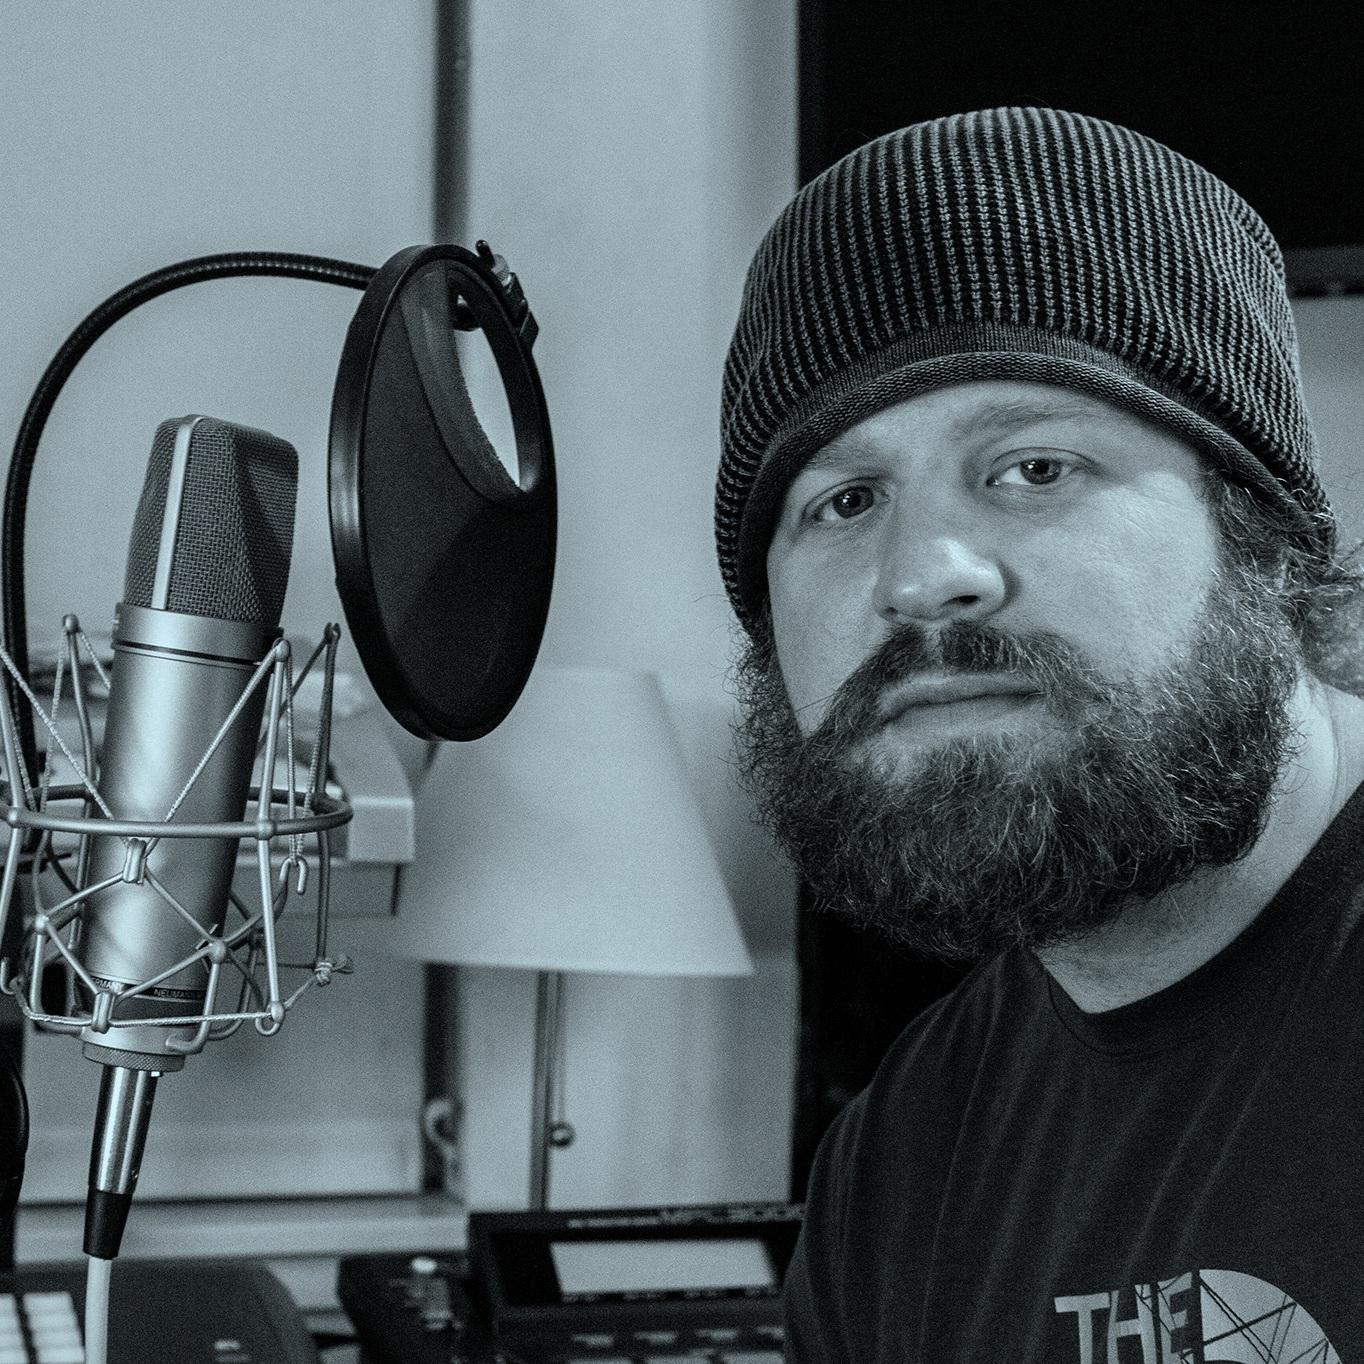 Tommy Mula - Rapper dude